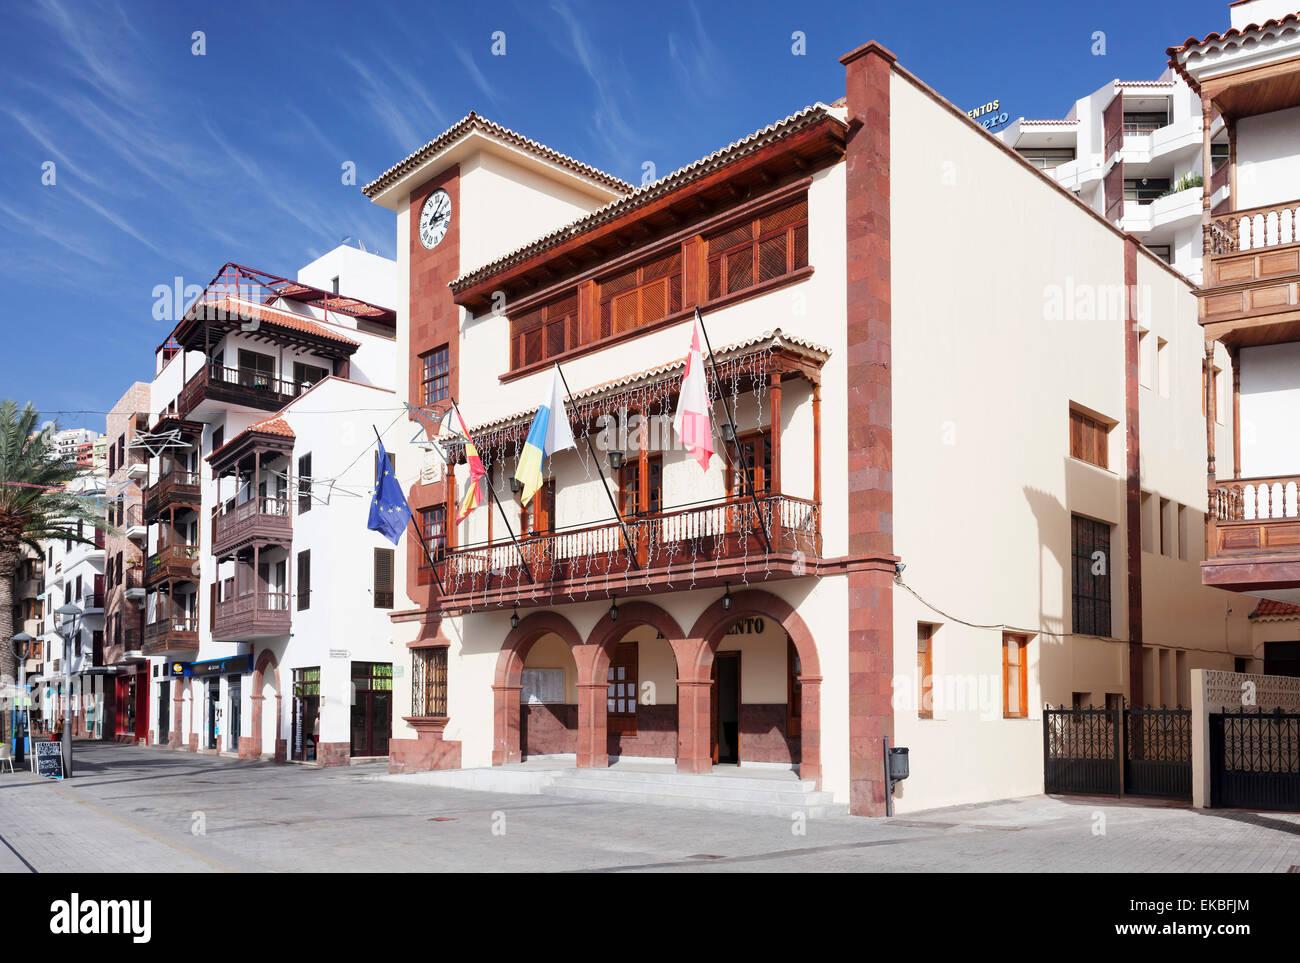 Town Hall at Plaza de las Americas Square, San Sebastian, La Gomera, Canary Islands, Spain, Europe - Stock Image